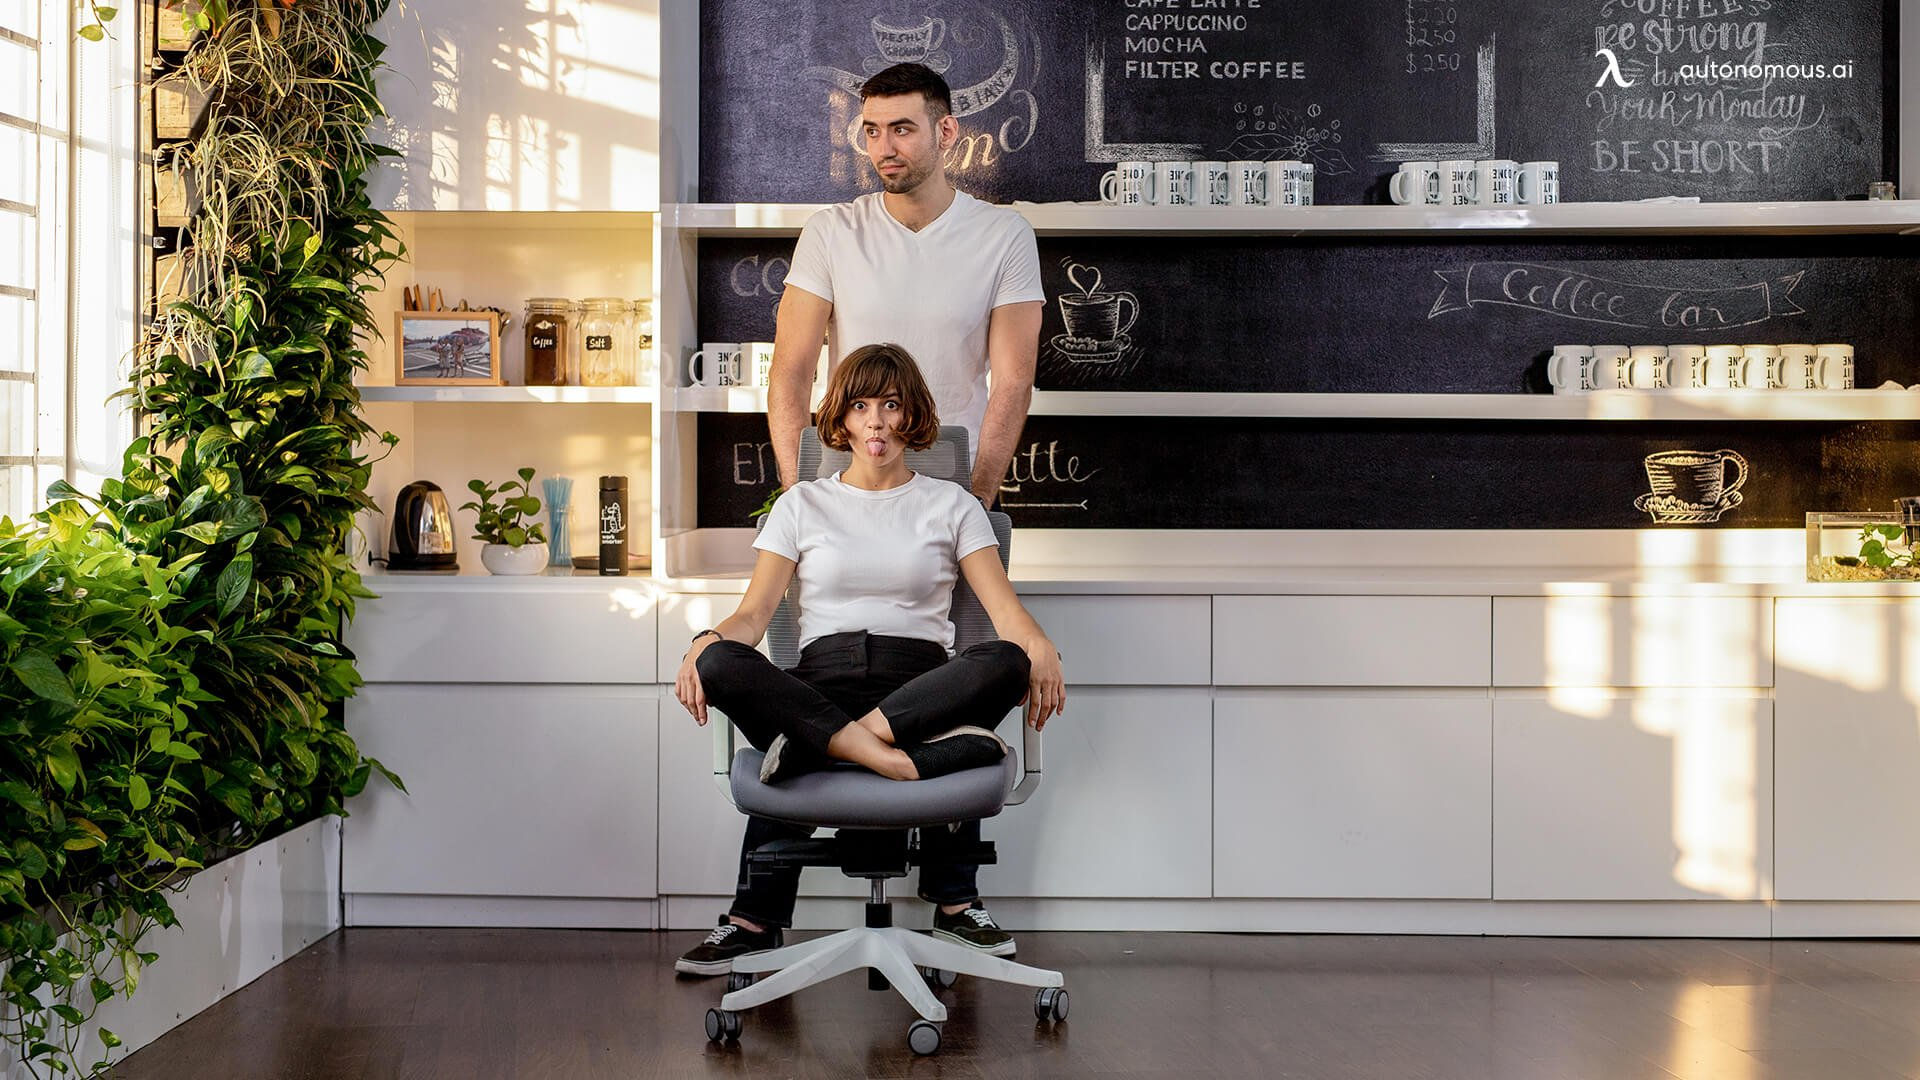 Never push office chair on hardwood floor